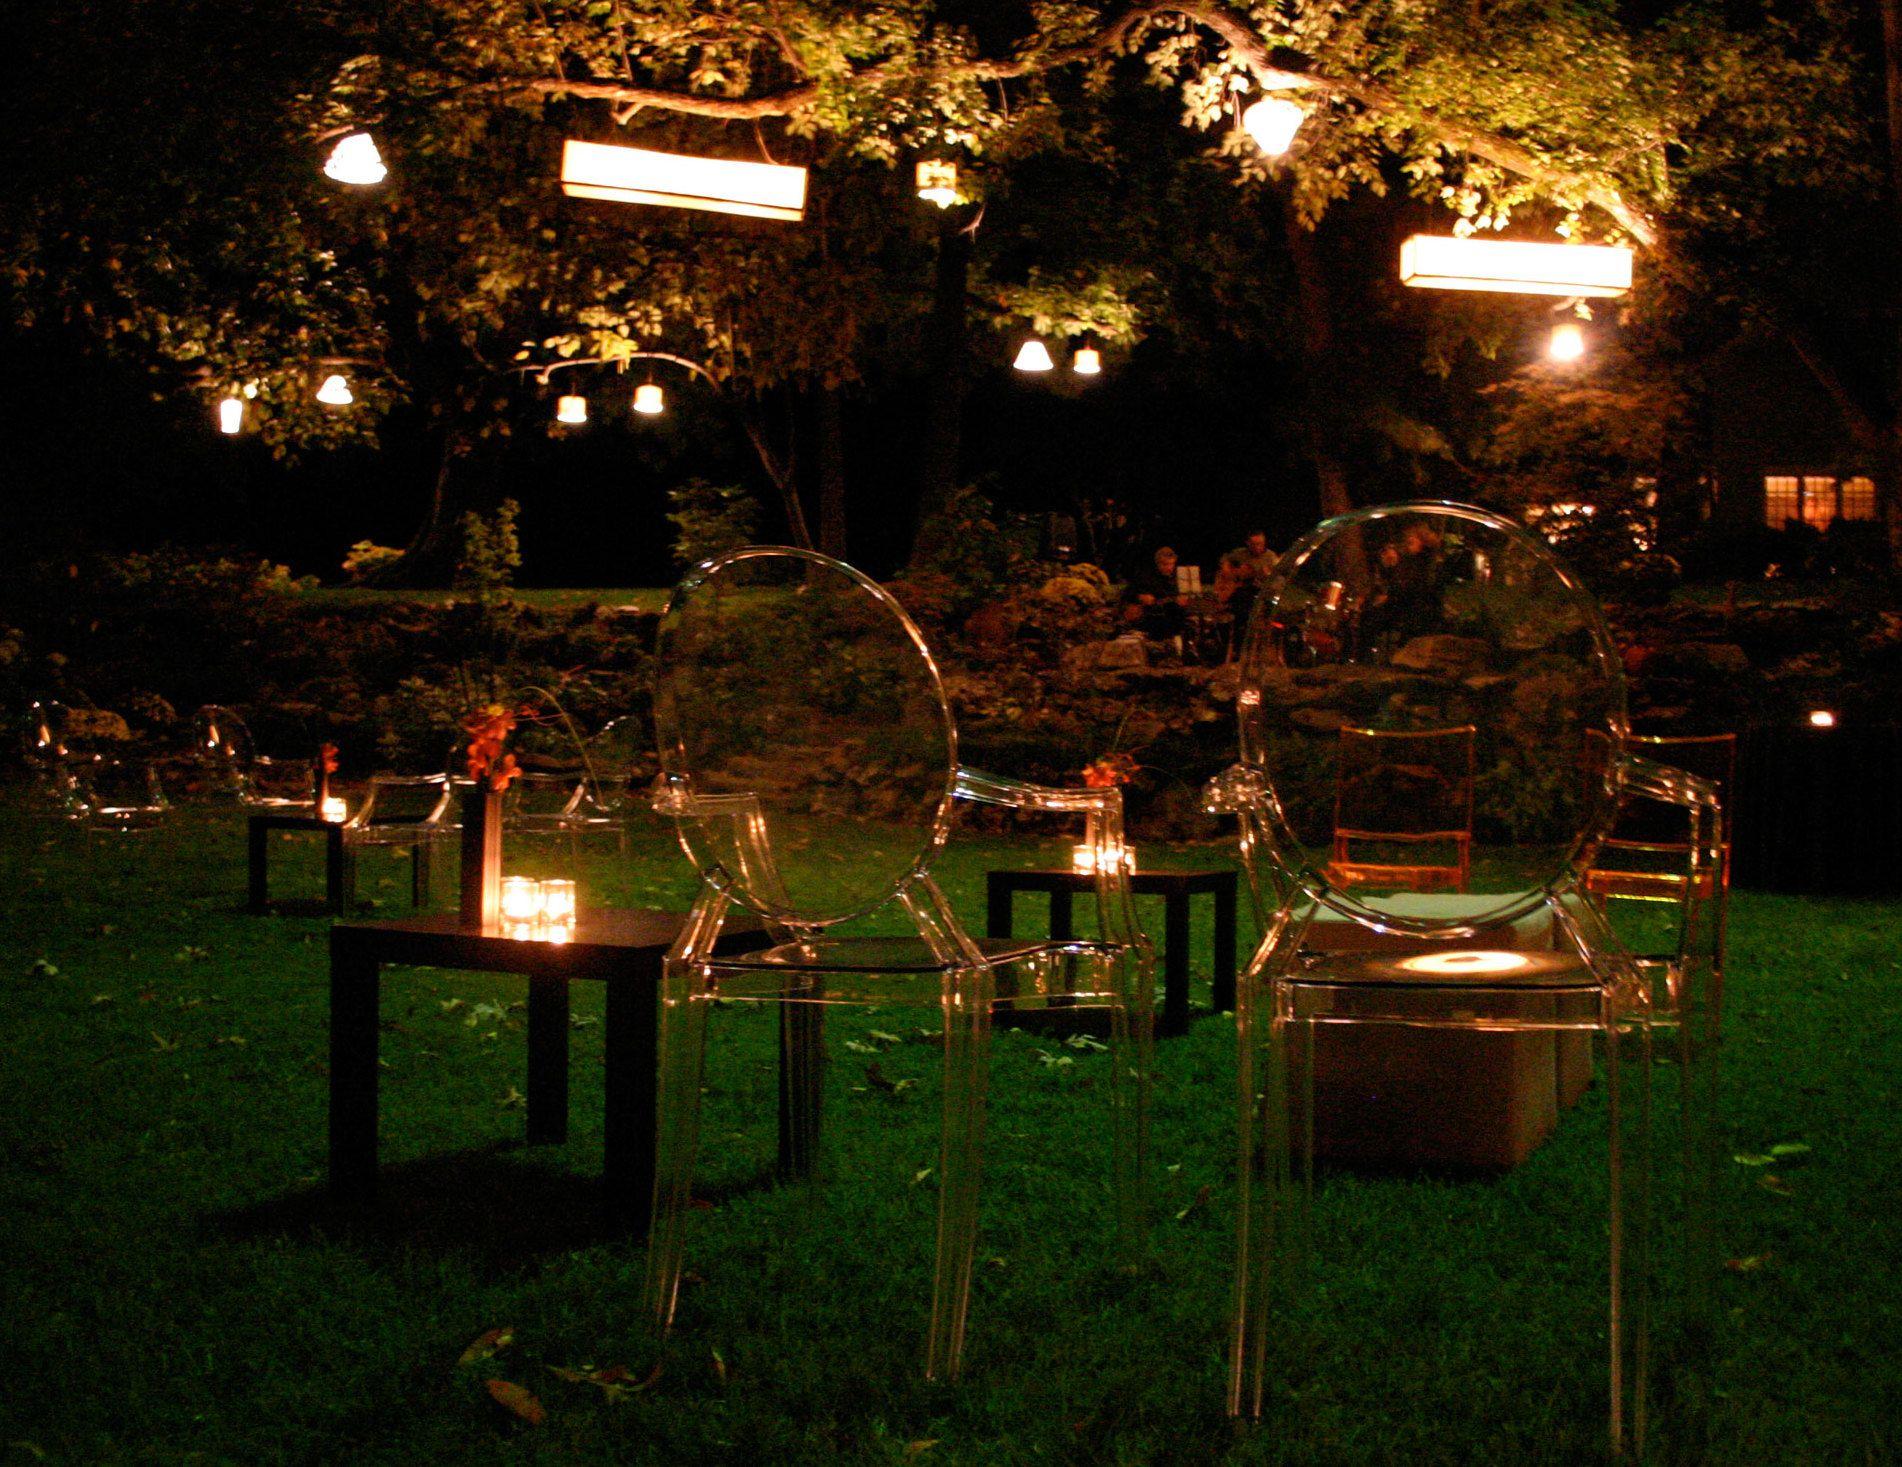 Coole Gartenparty Ideen Gartentisch Kaffeetisch Hochzeit Beleuchtung